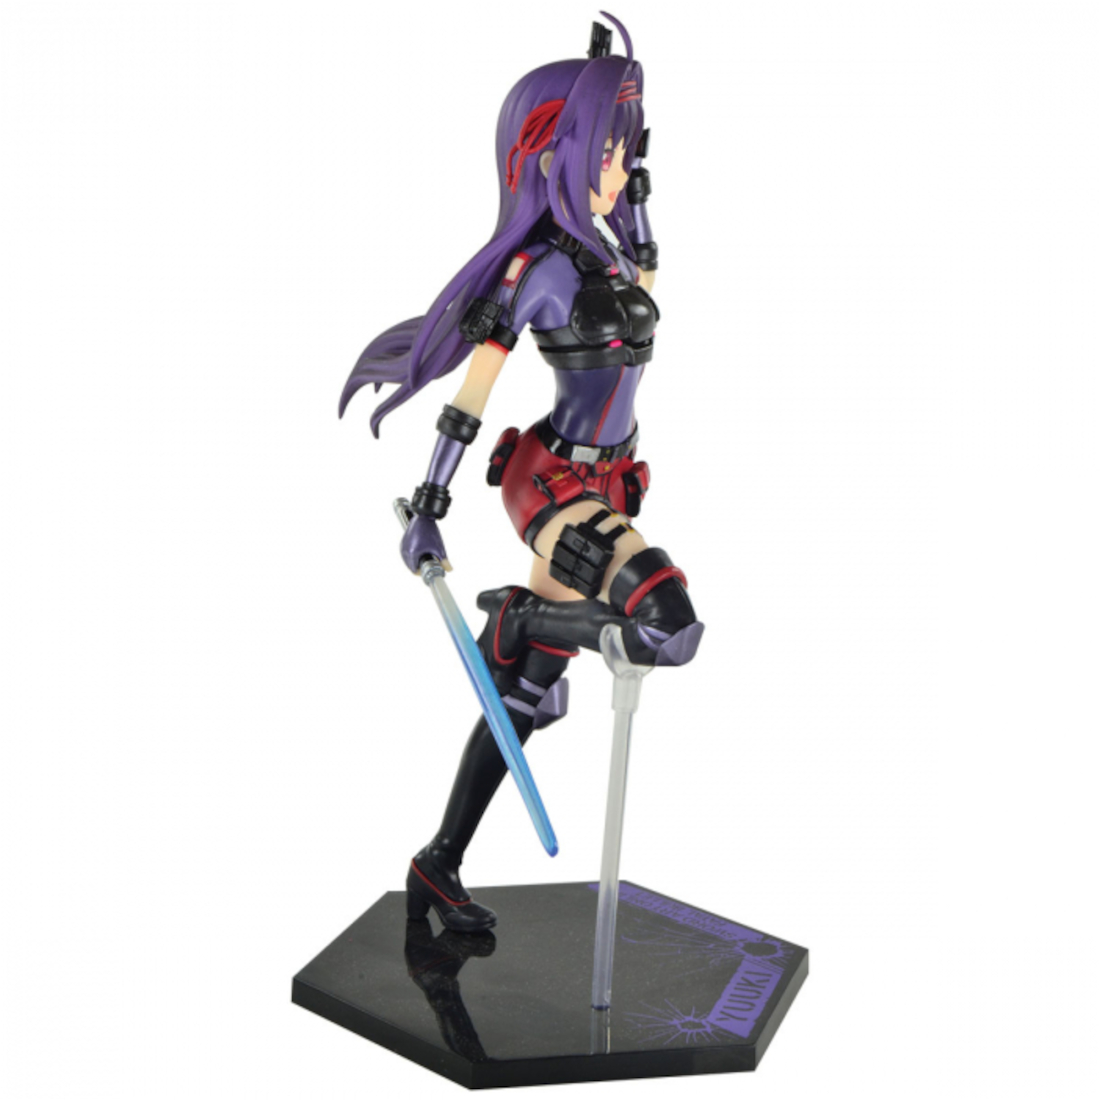 Banpresto Sword Art Online Ichiban Kuji Yuuki